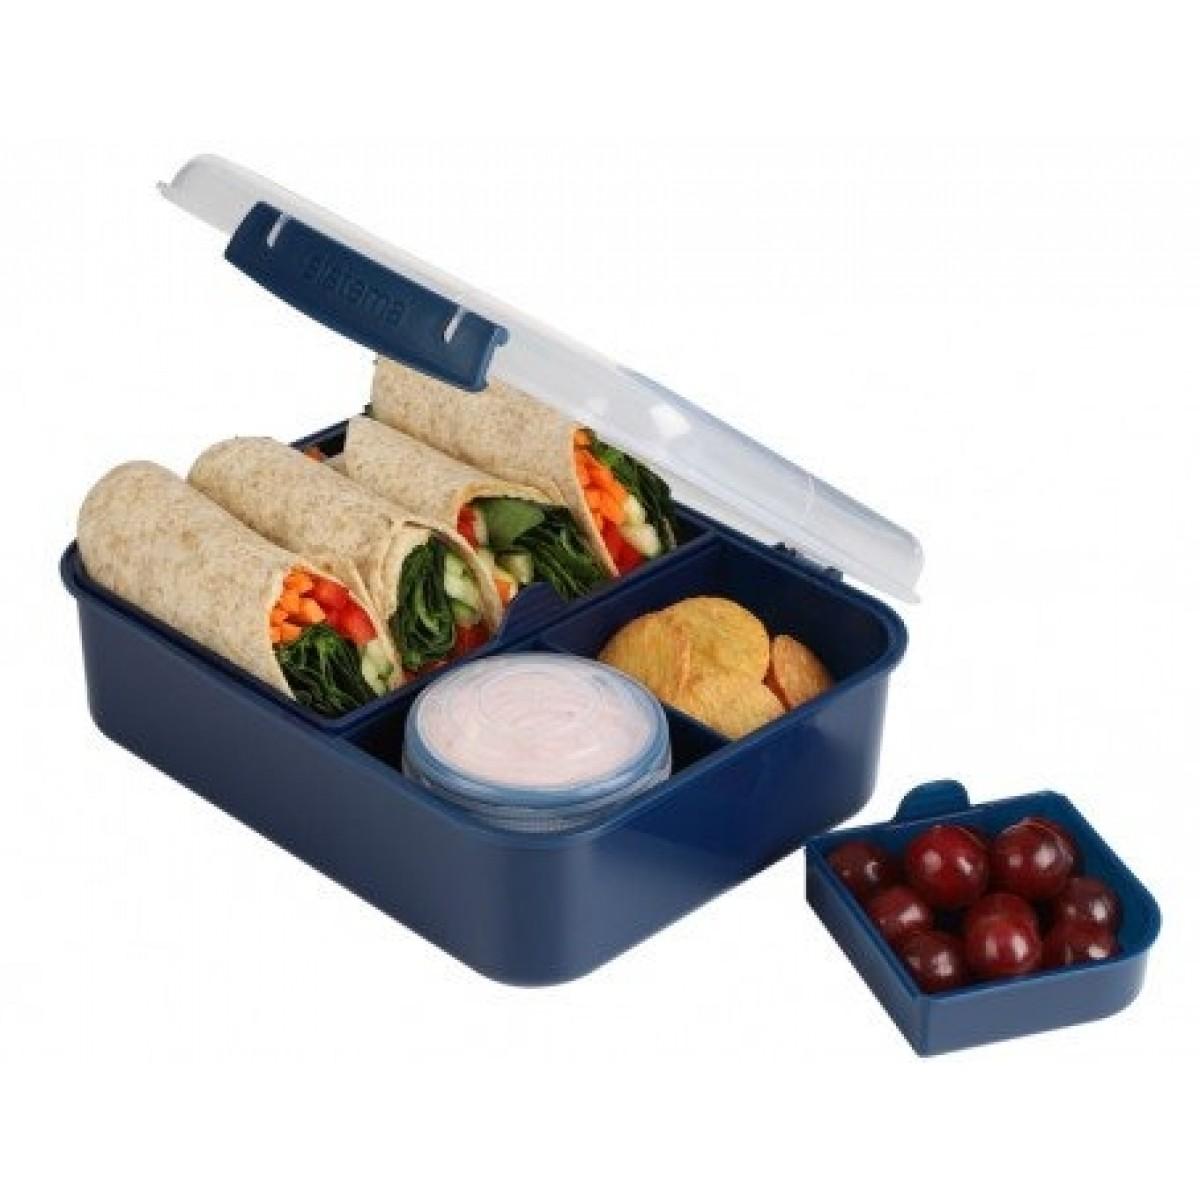 SISTEMA Madkasse Bento lunch renew 1,65 ltr - blå